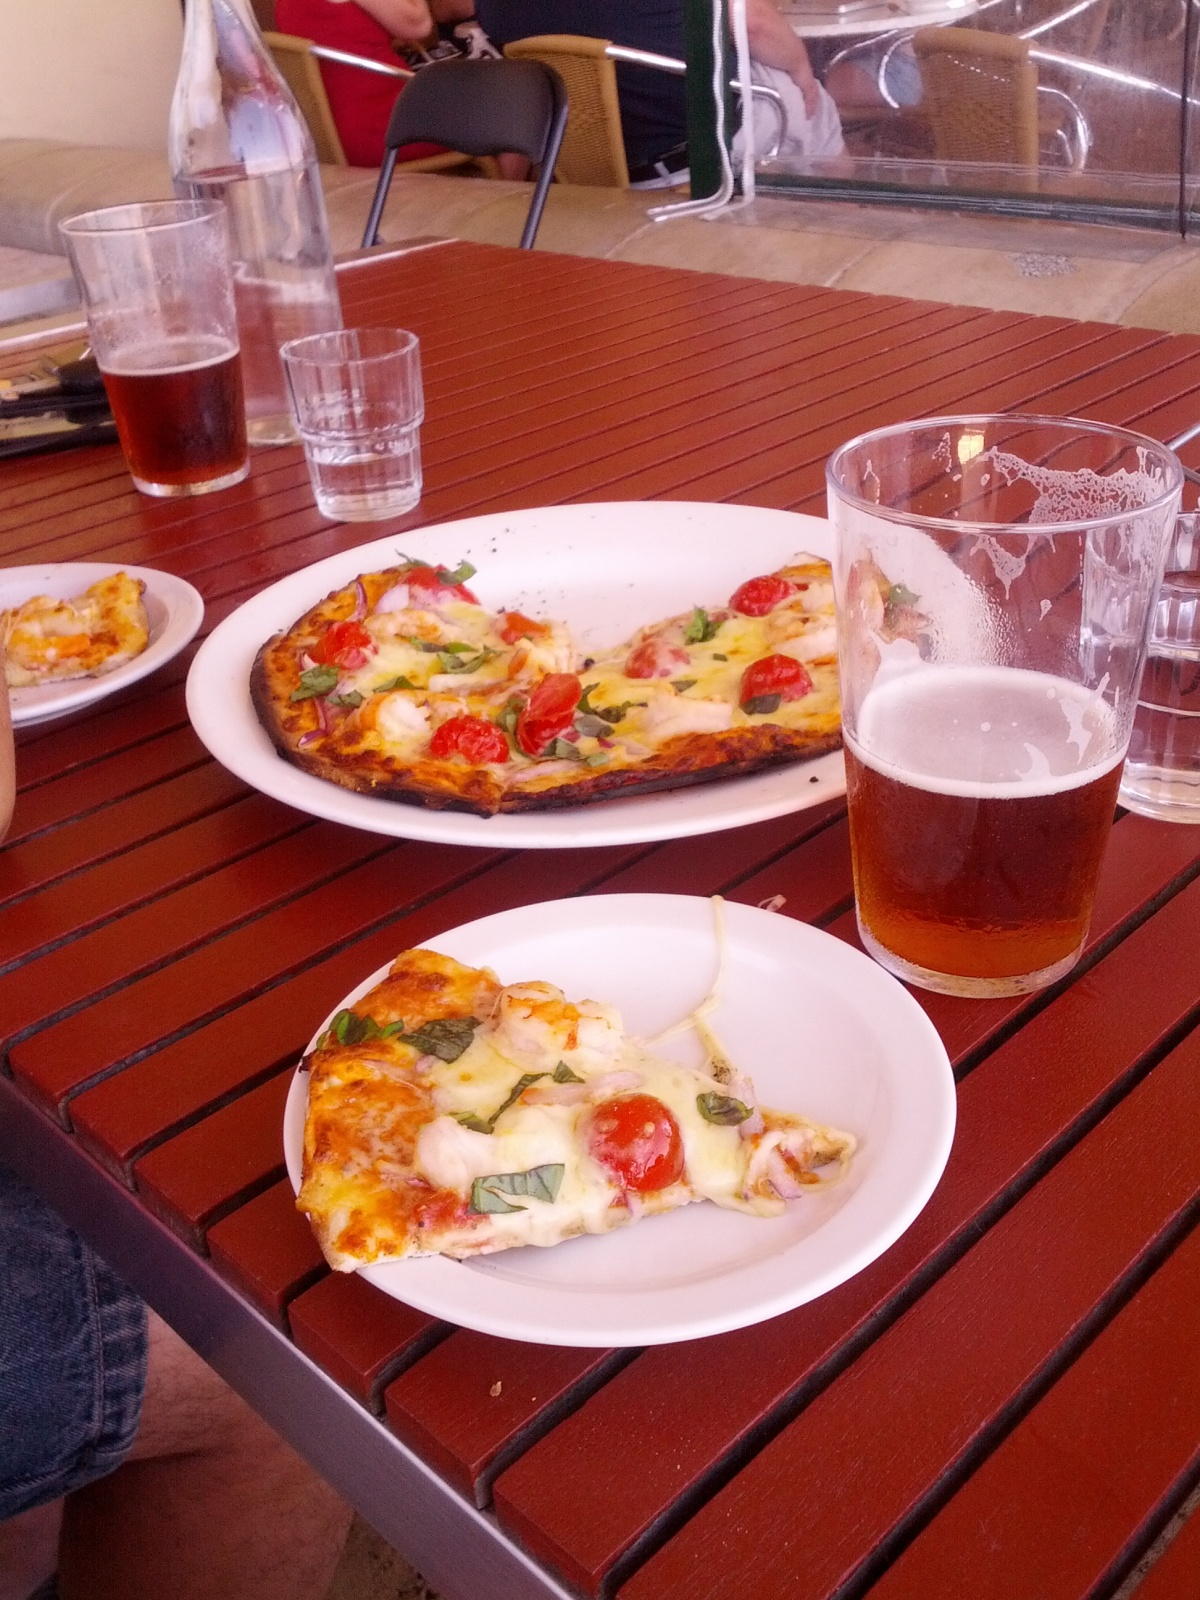 Pizza + Mash